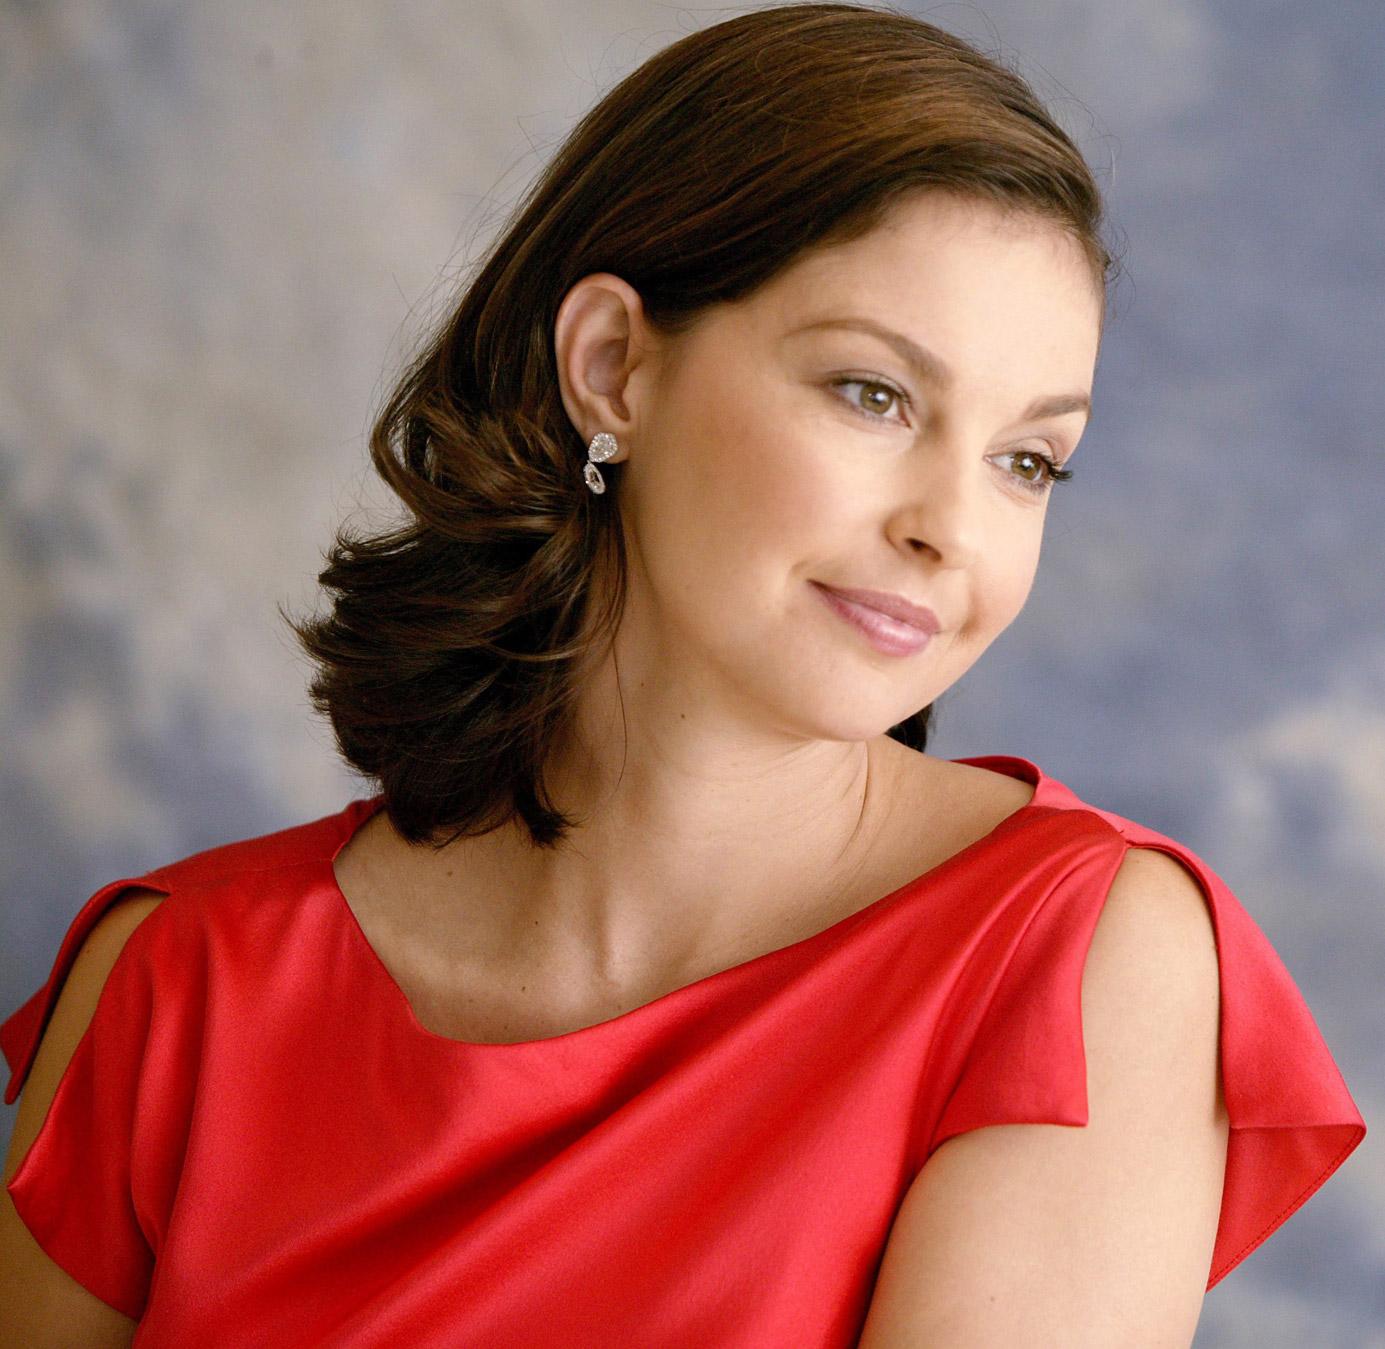 Pretty Desktop Wallpapers For Girls 2012 Ashley Judd Picture 1hot Wallpapers Hot Wallpapers